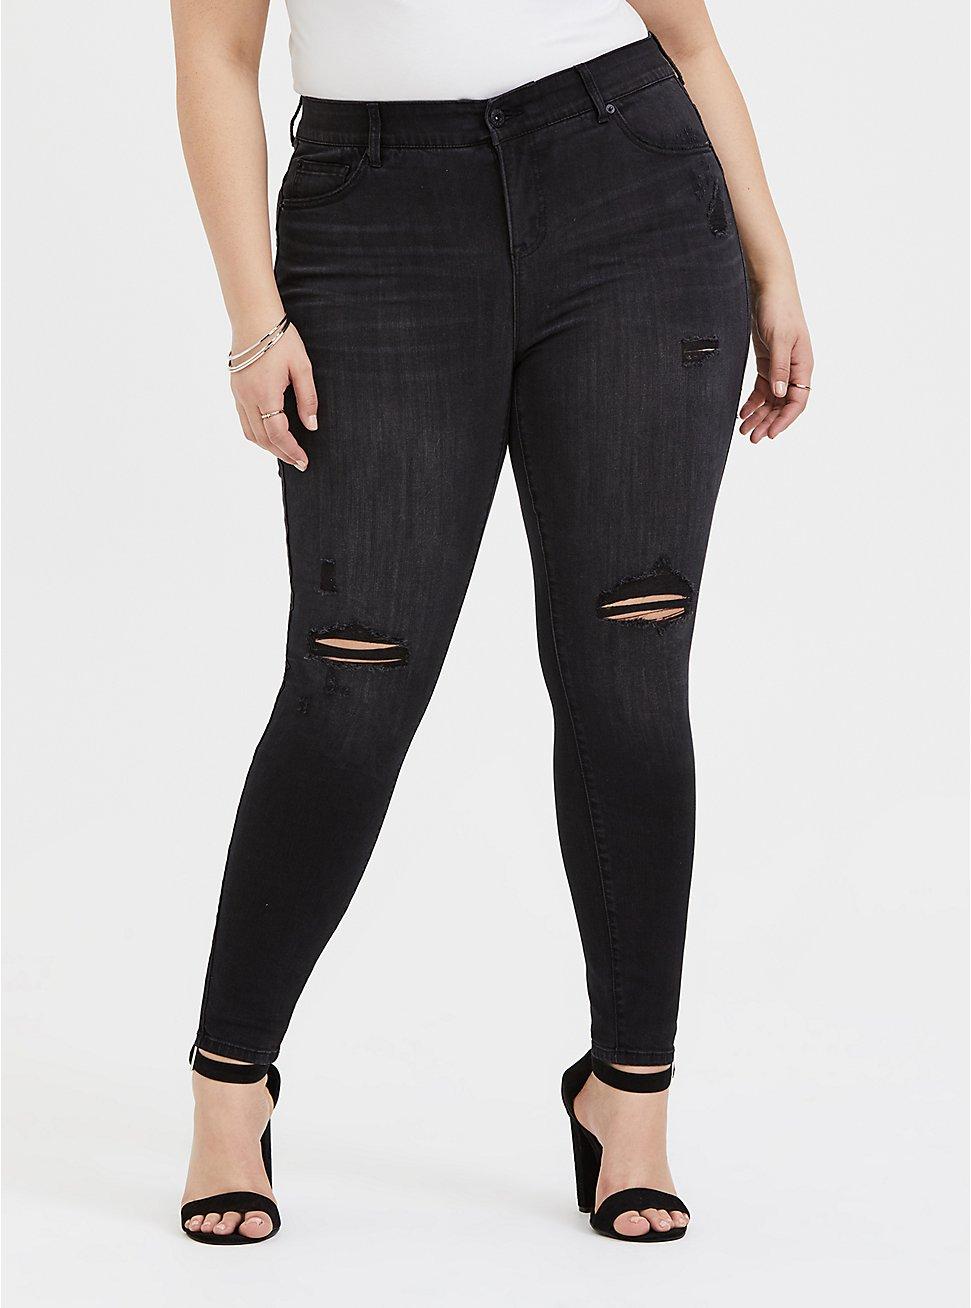 Bombshell Skinny Jean - Premium Stretch Black Wash, COOL CAT, hi-res